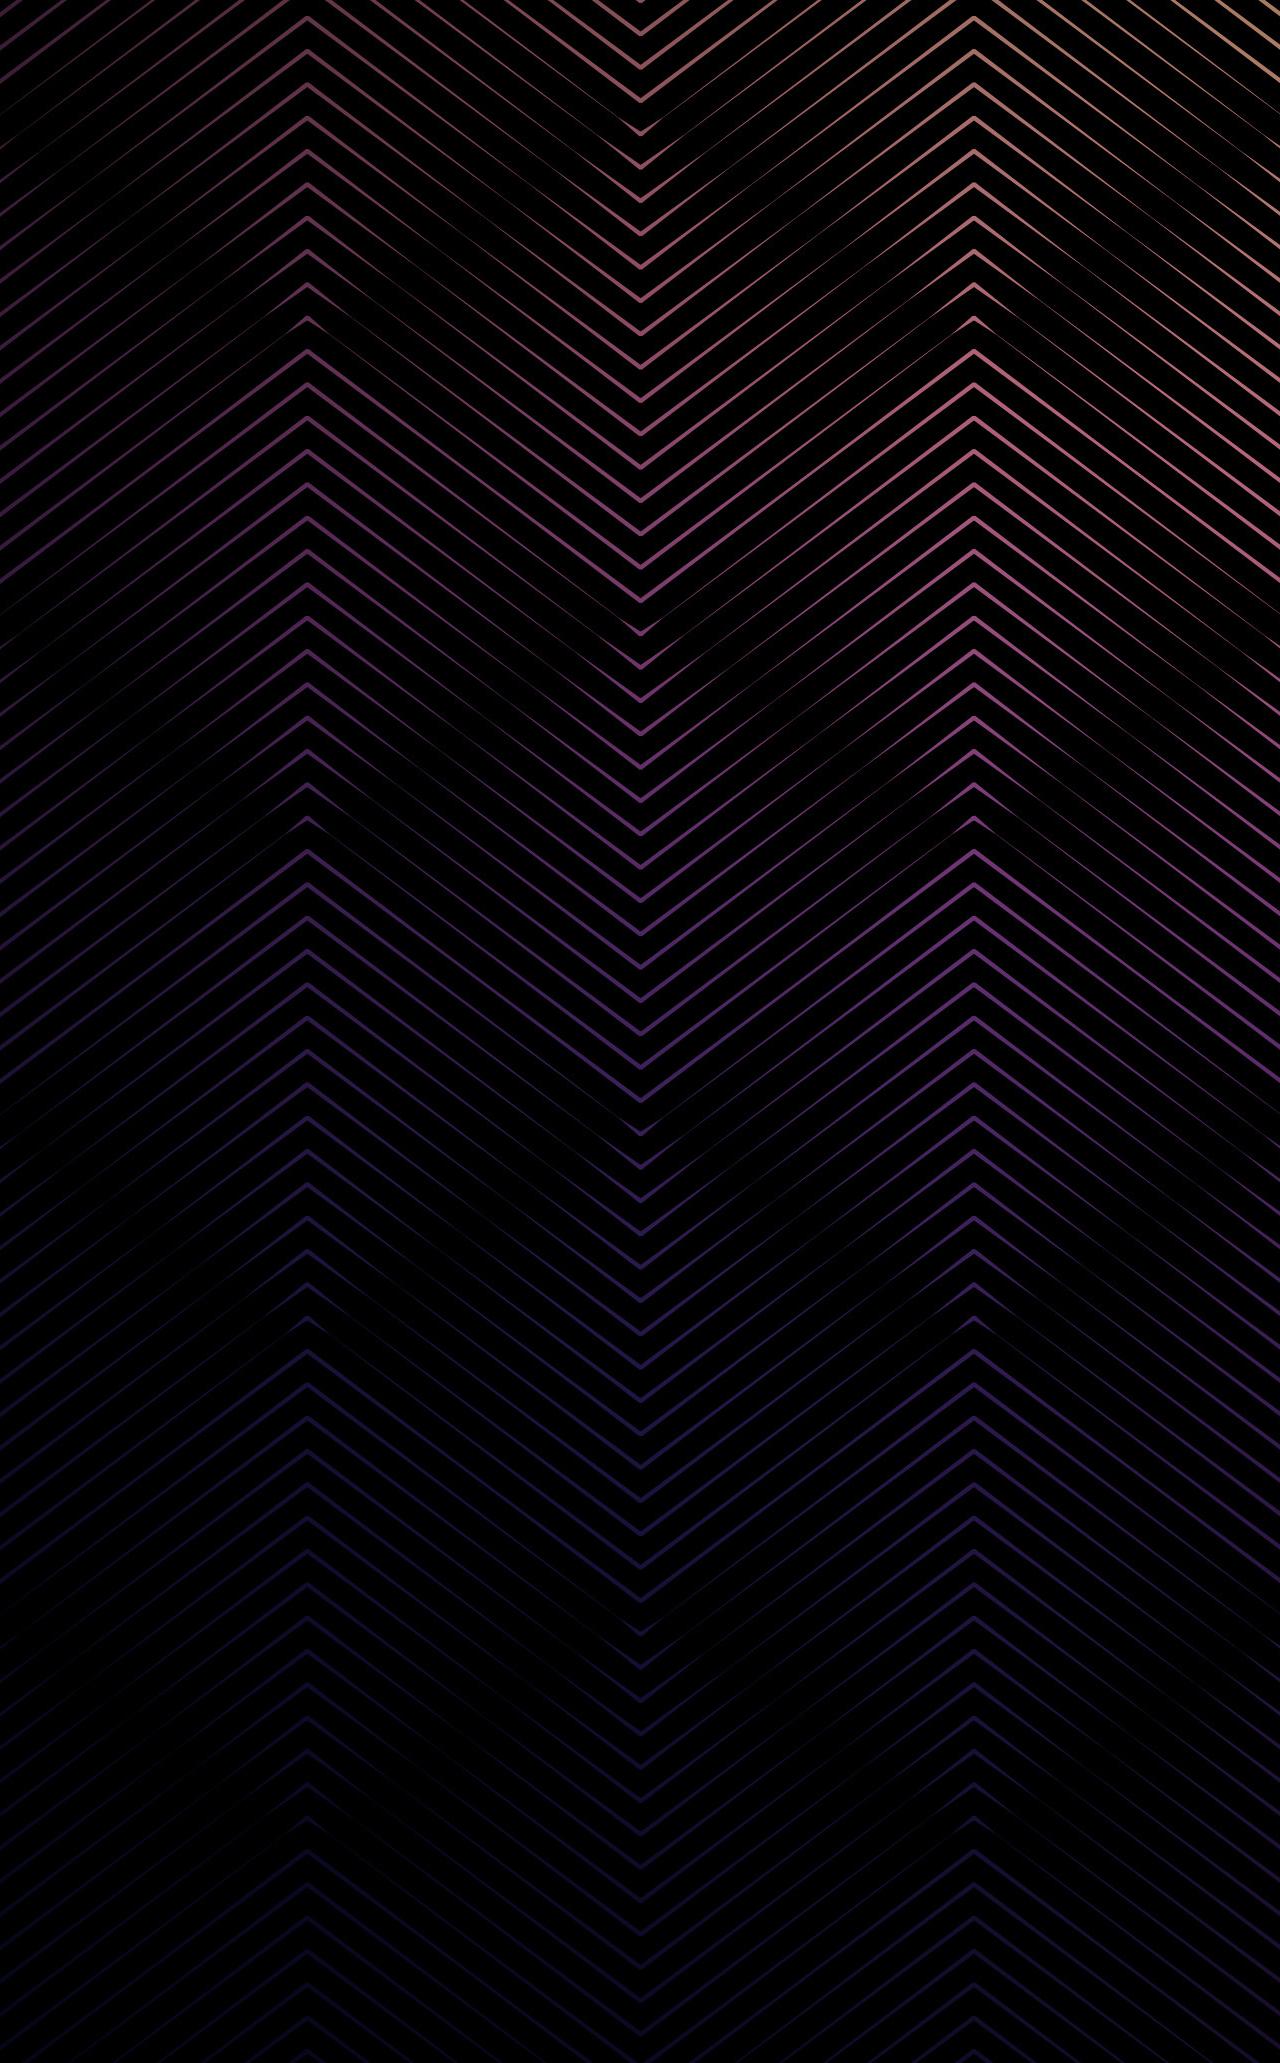 Download 1280x2120 Wallpaper Neon Stripes Dark Abstract Iphone 6